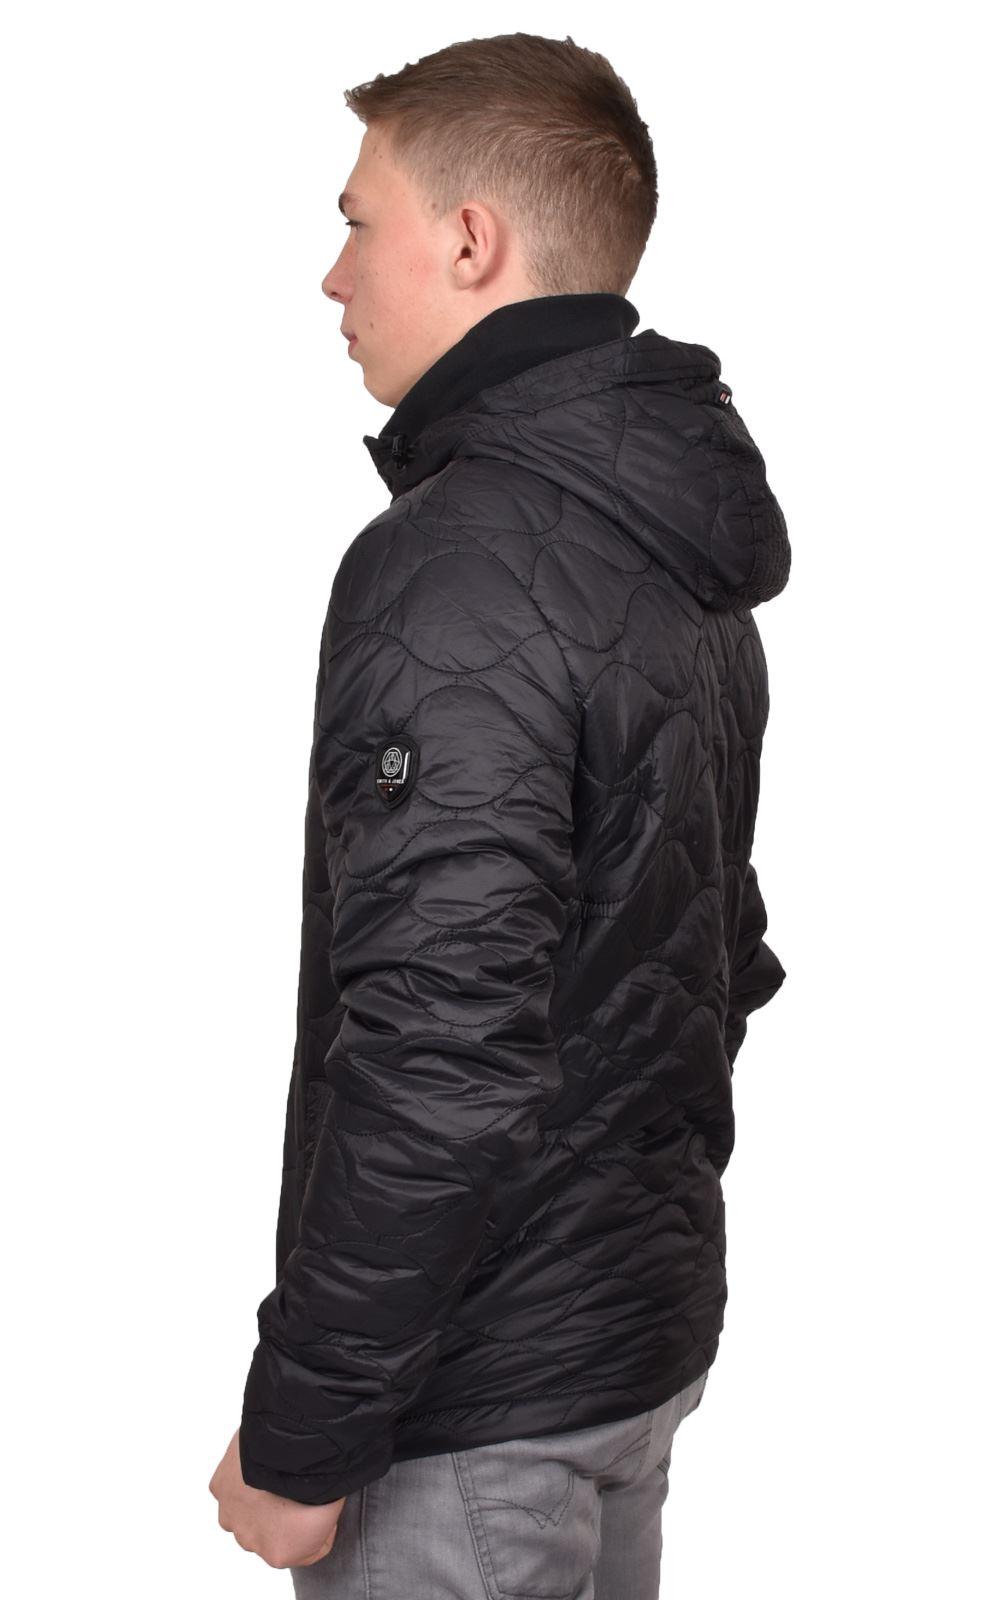 Mens-Smith-amp-Jones-Jacket-Full-Zip-Fleece-Lined-Hooded-Light-Weight-Warm-Coat thumbnail 4